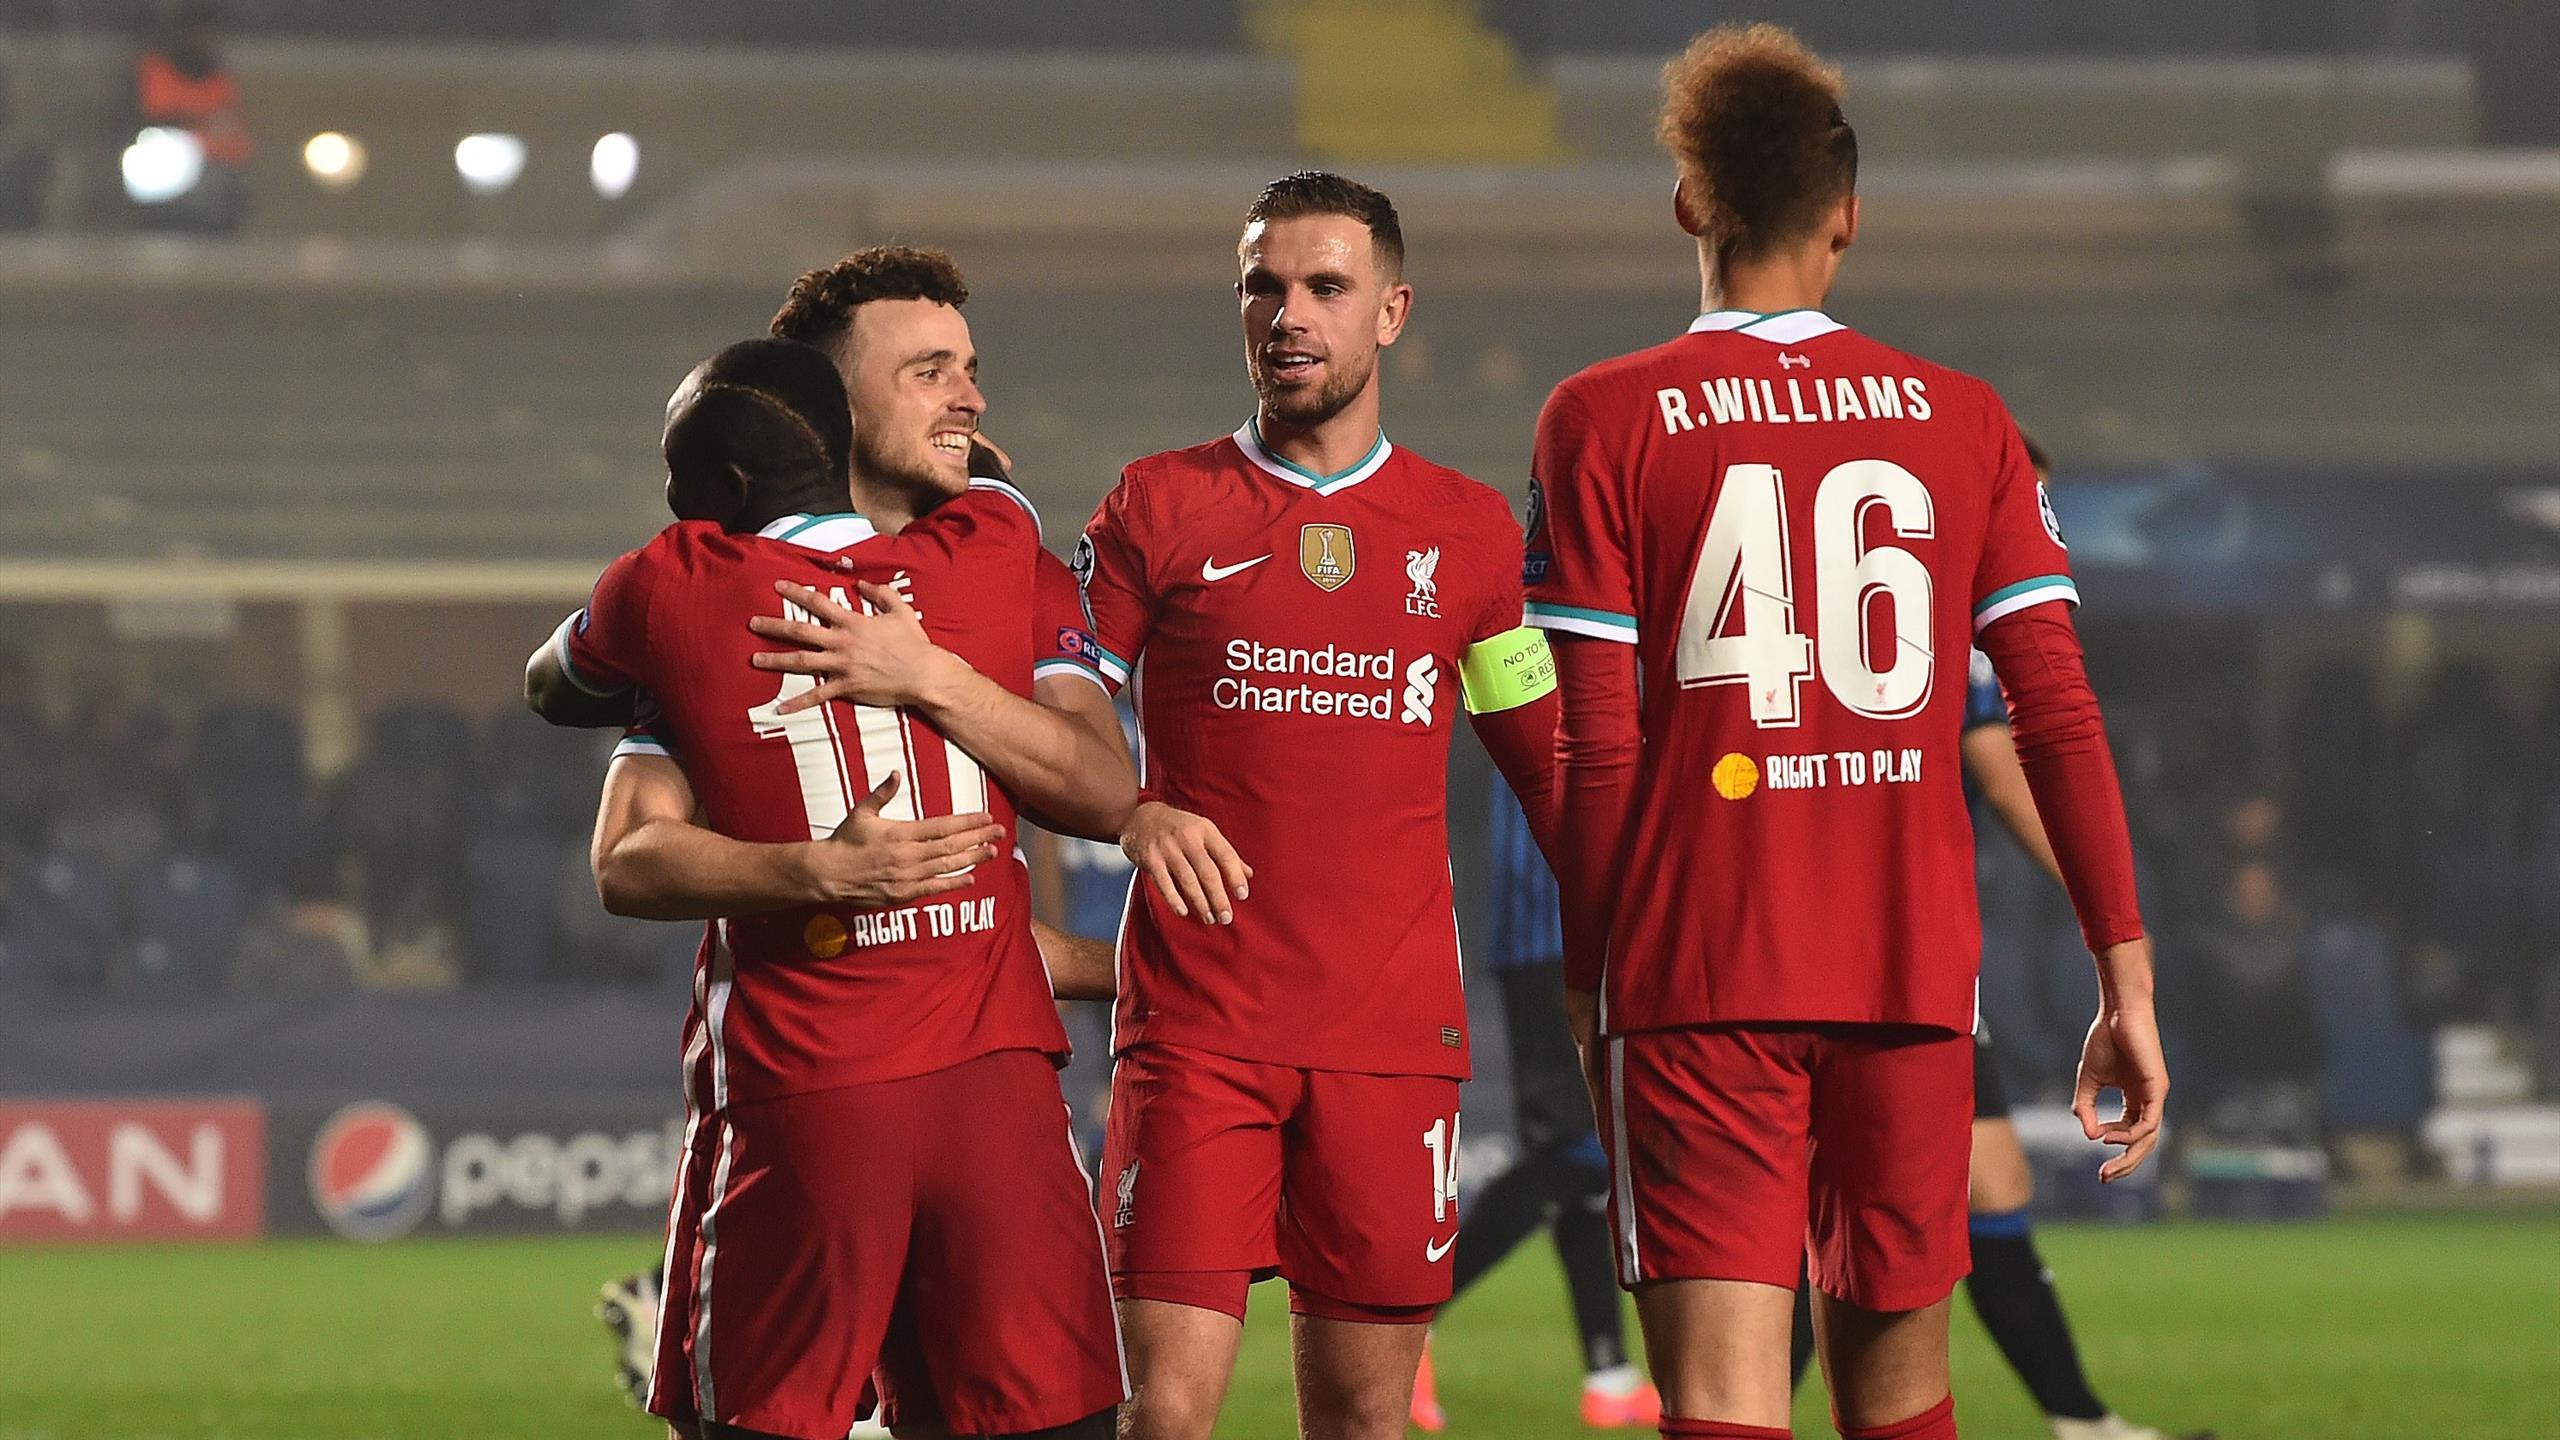 champions league diogo jota scores hat trick as liverpool thrash atalanta eurosport champions league diogo jota scores hat